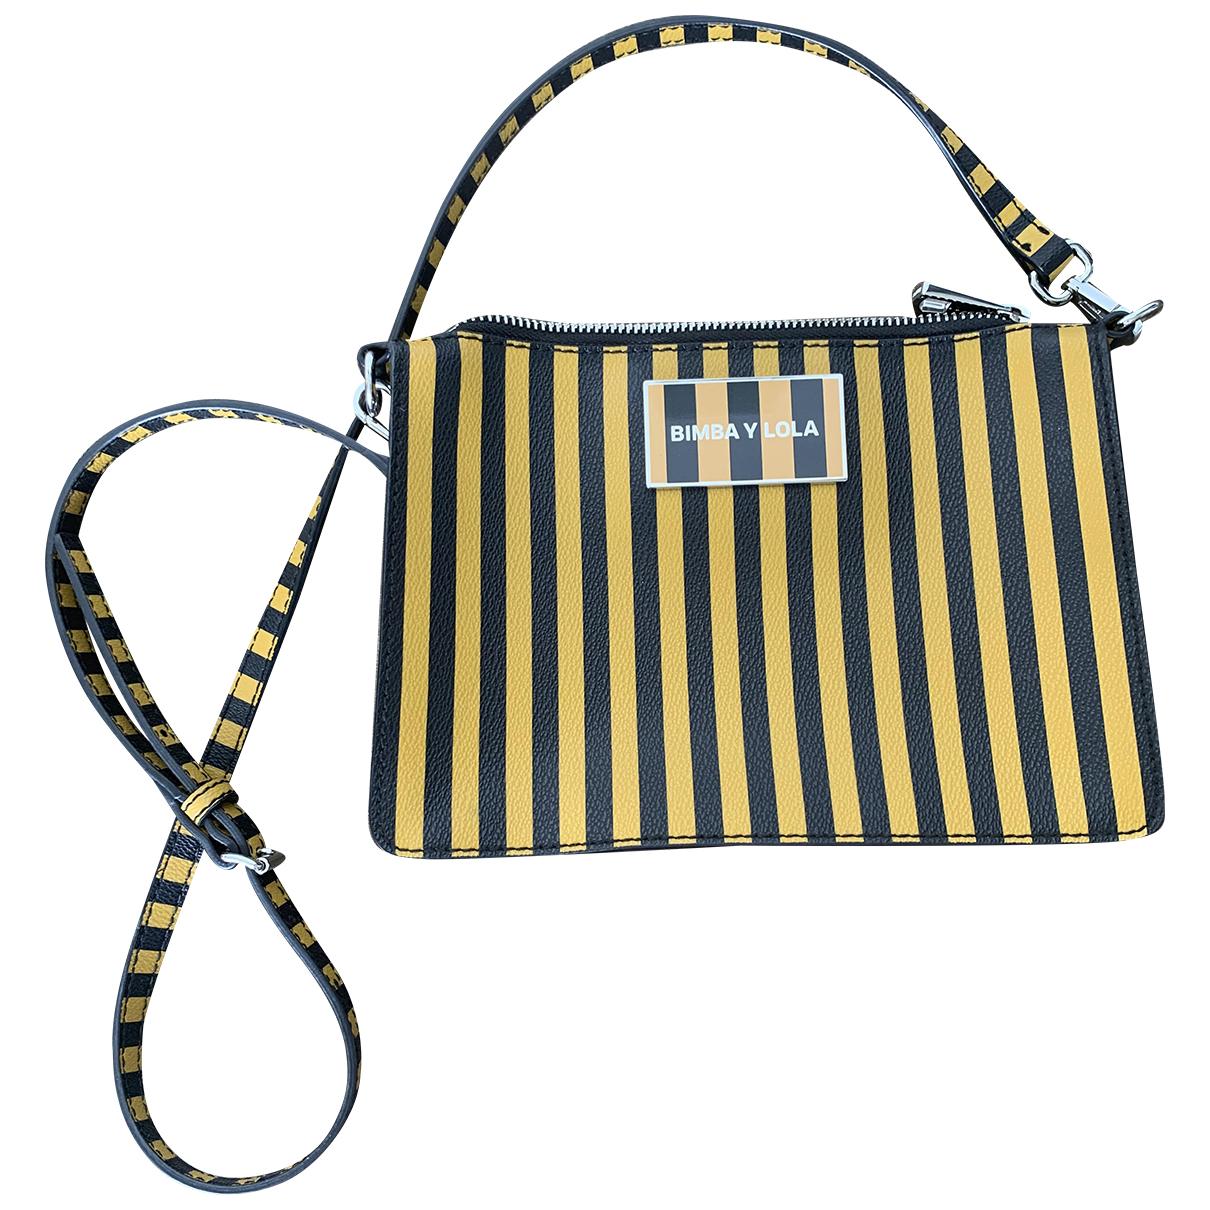 Bimba Y Lola N Yellow handbag for Women N